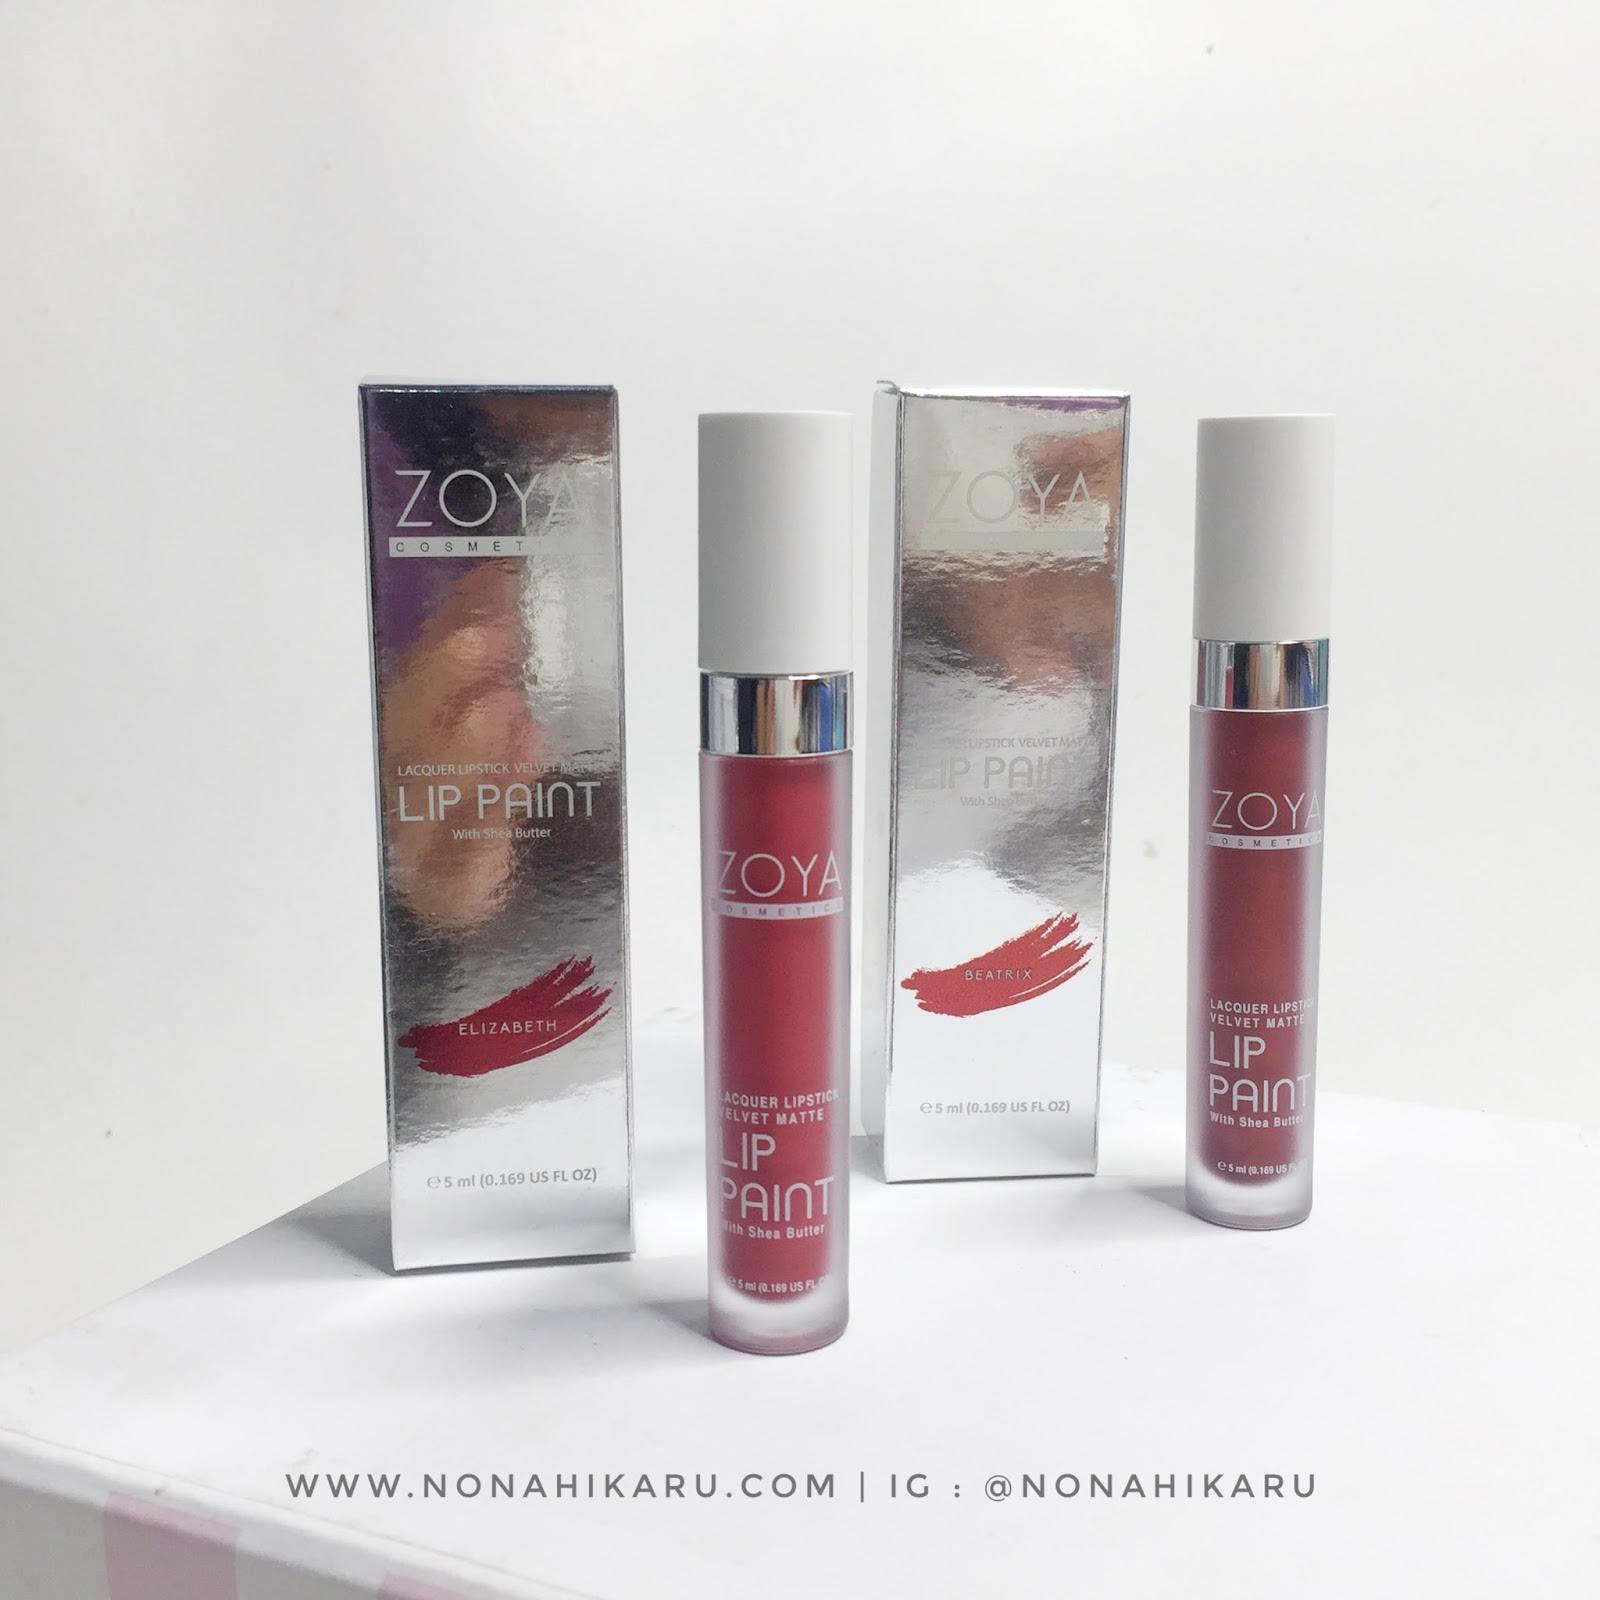 Review Zoya Cosmetics New Limited Lip Paint Metallic Series Produk Ini Di Klaim Memiliki Formula Yang Tetap Transferproof Long Lasting Dan Moisturizing Karena Kandungan Shea Butter Sebagai Antioksidan